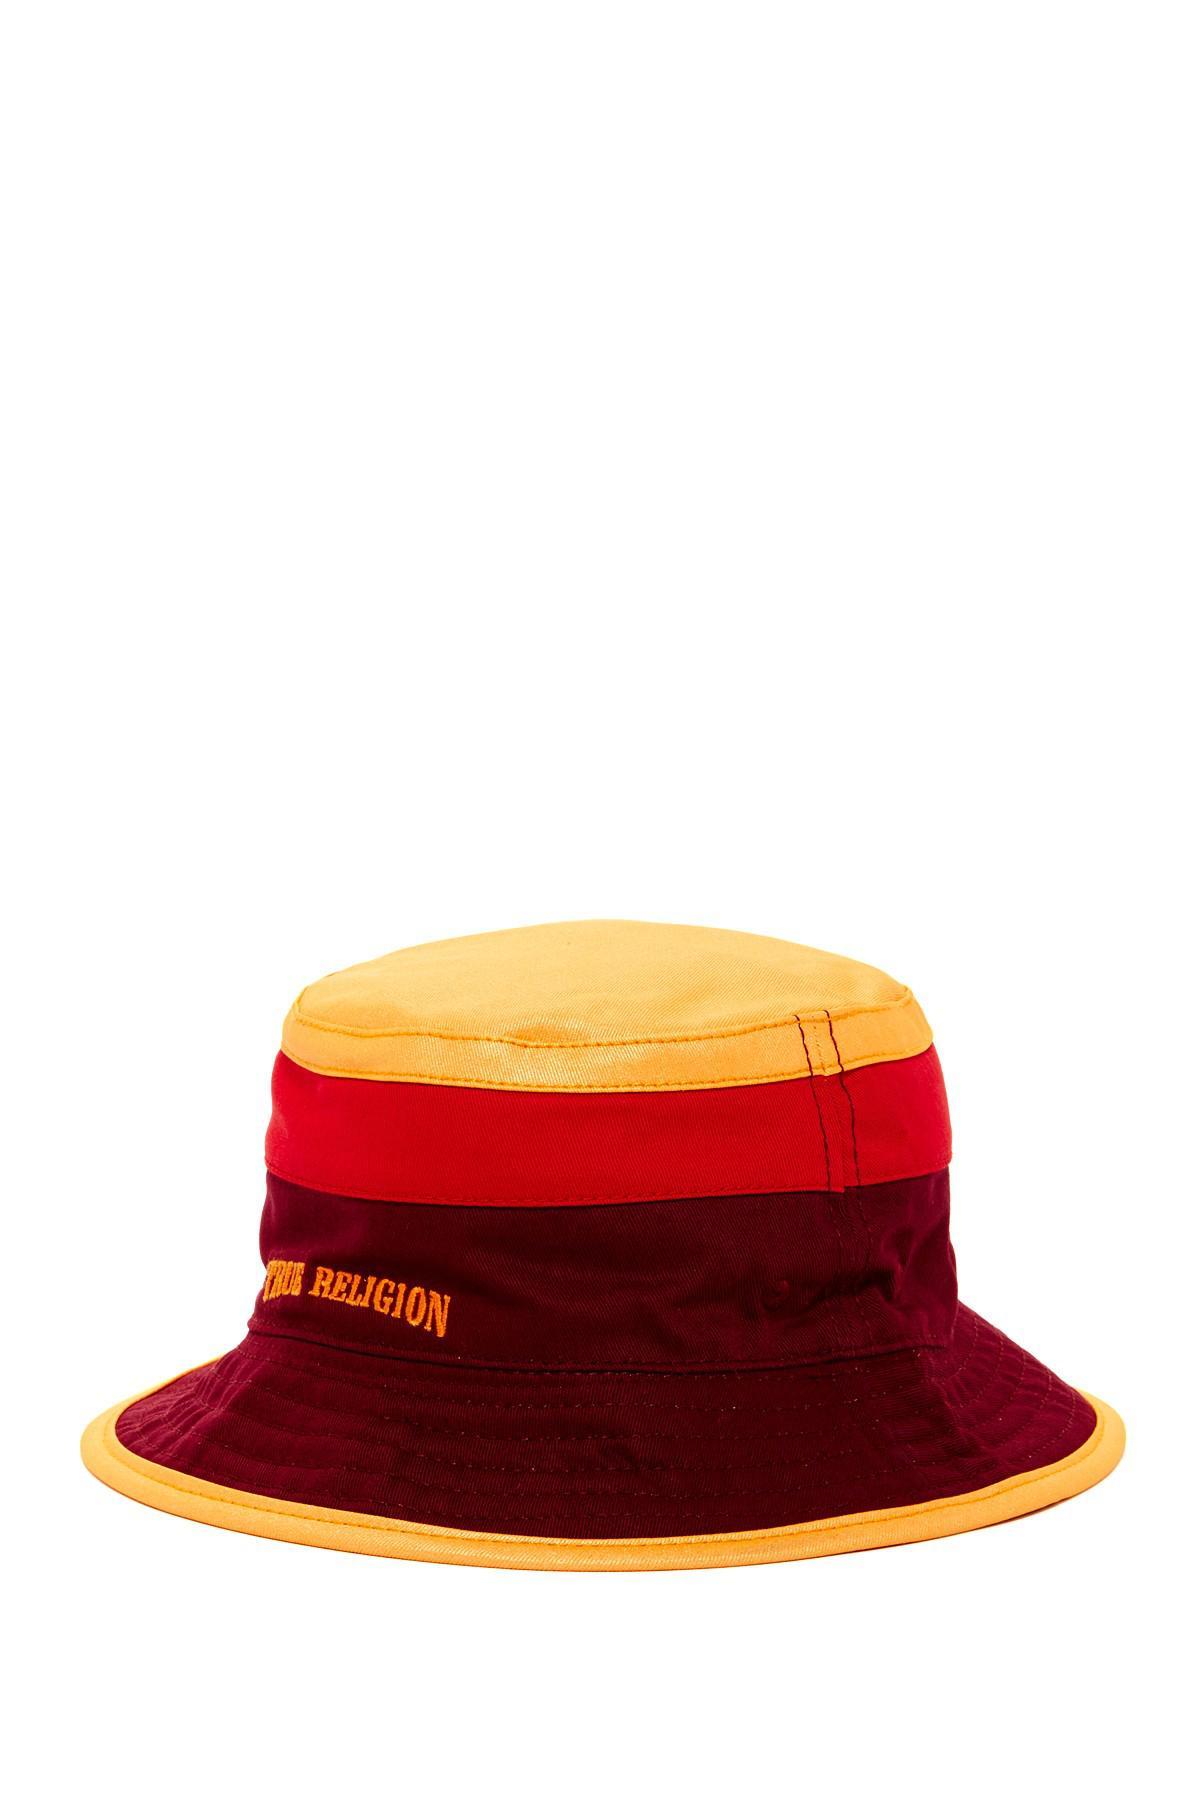 Lyst - True Religion Reversible Colorblock Bucket Hat in Red 8a898c93e9e2